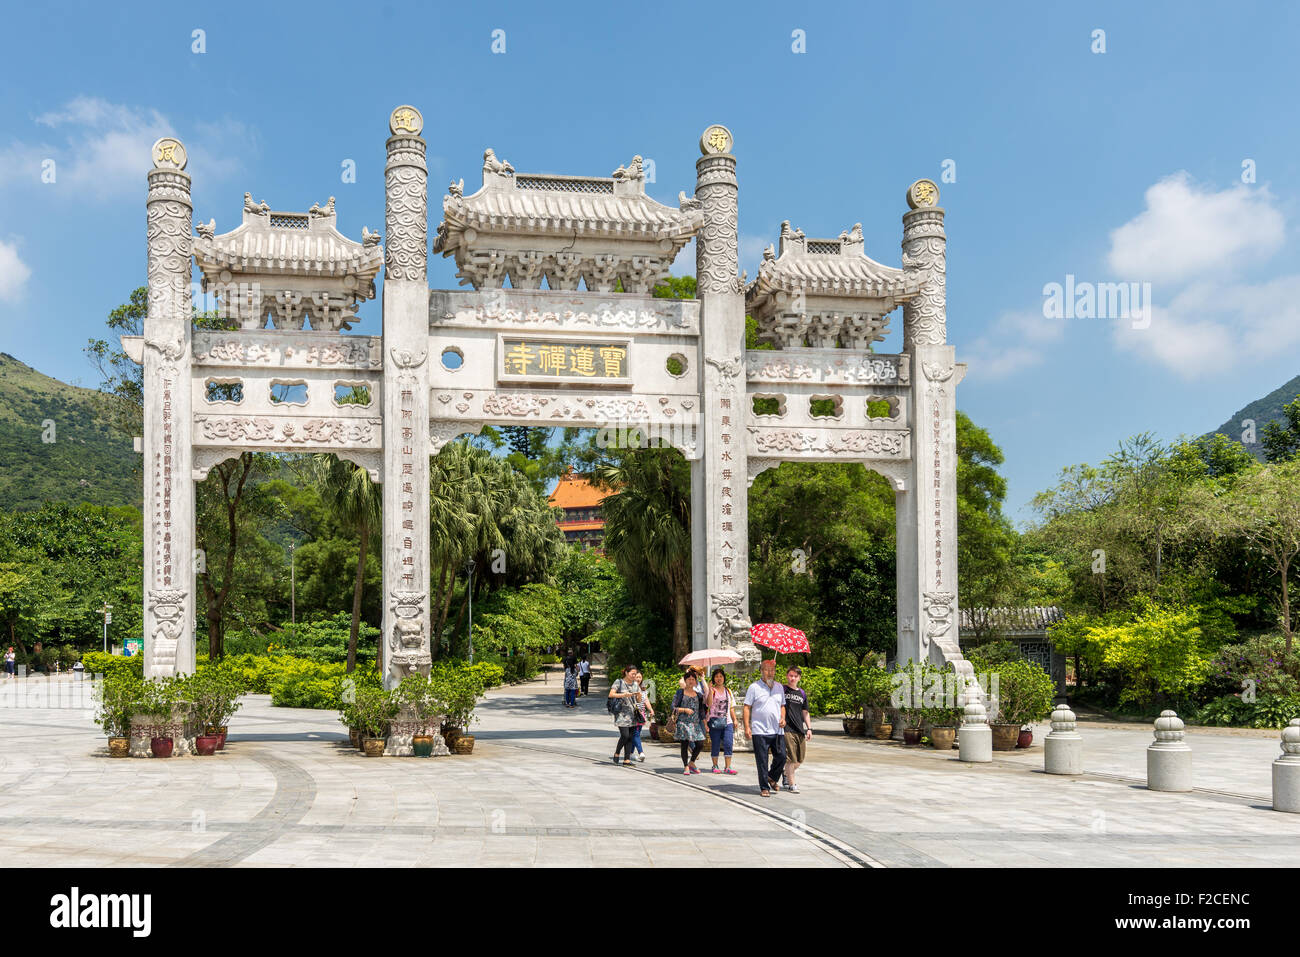 Entrance gate and walkway to Tian Tin monastery and the Big Buddha at Ngong Ping village on Lantau Island, Hong - Stock Image